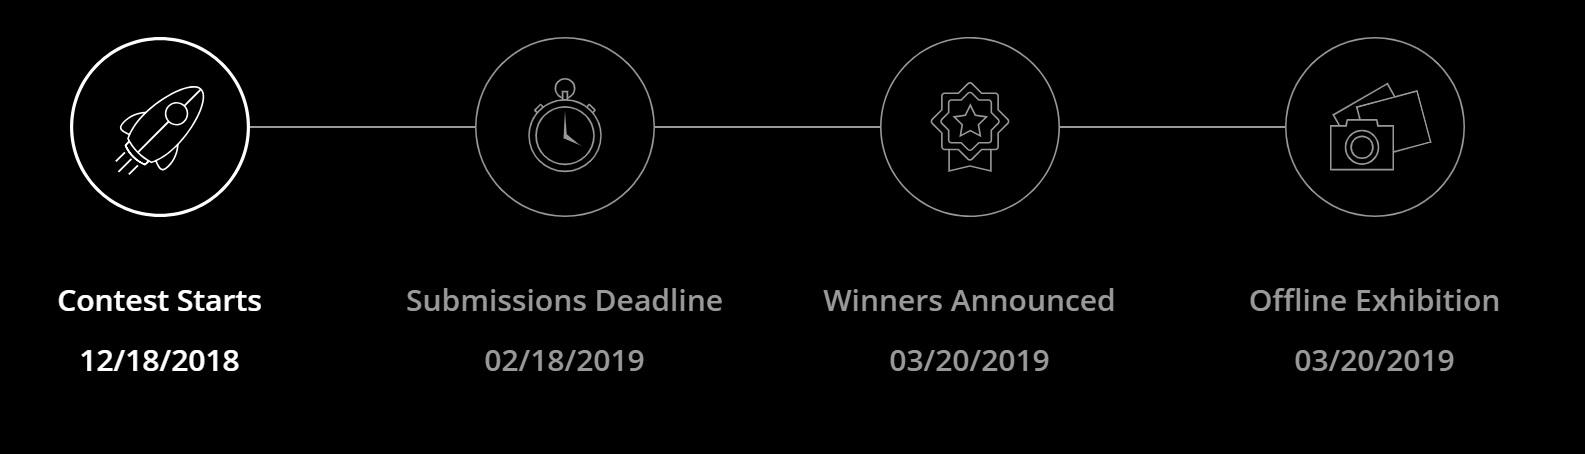 DJI Contest Deadline